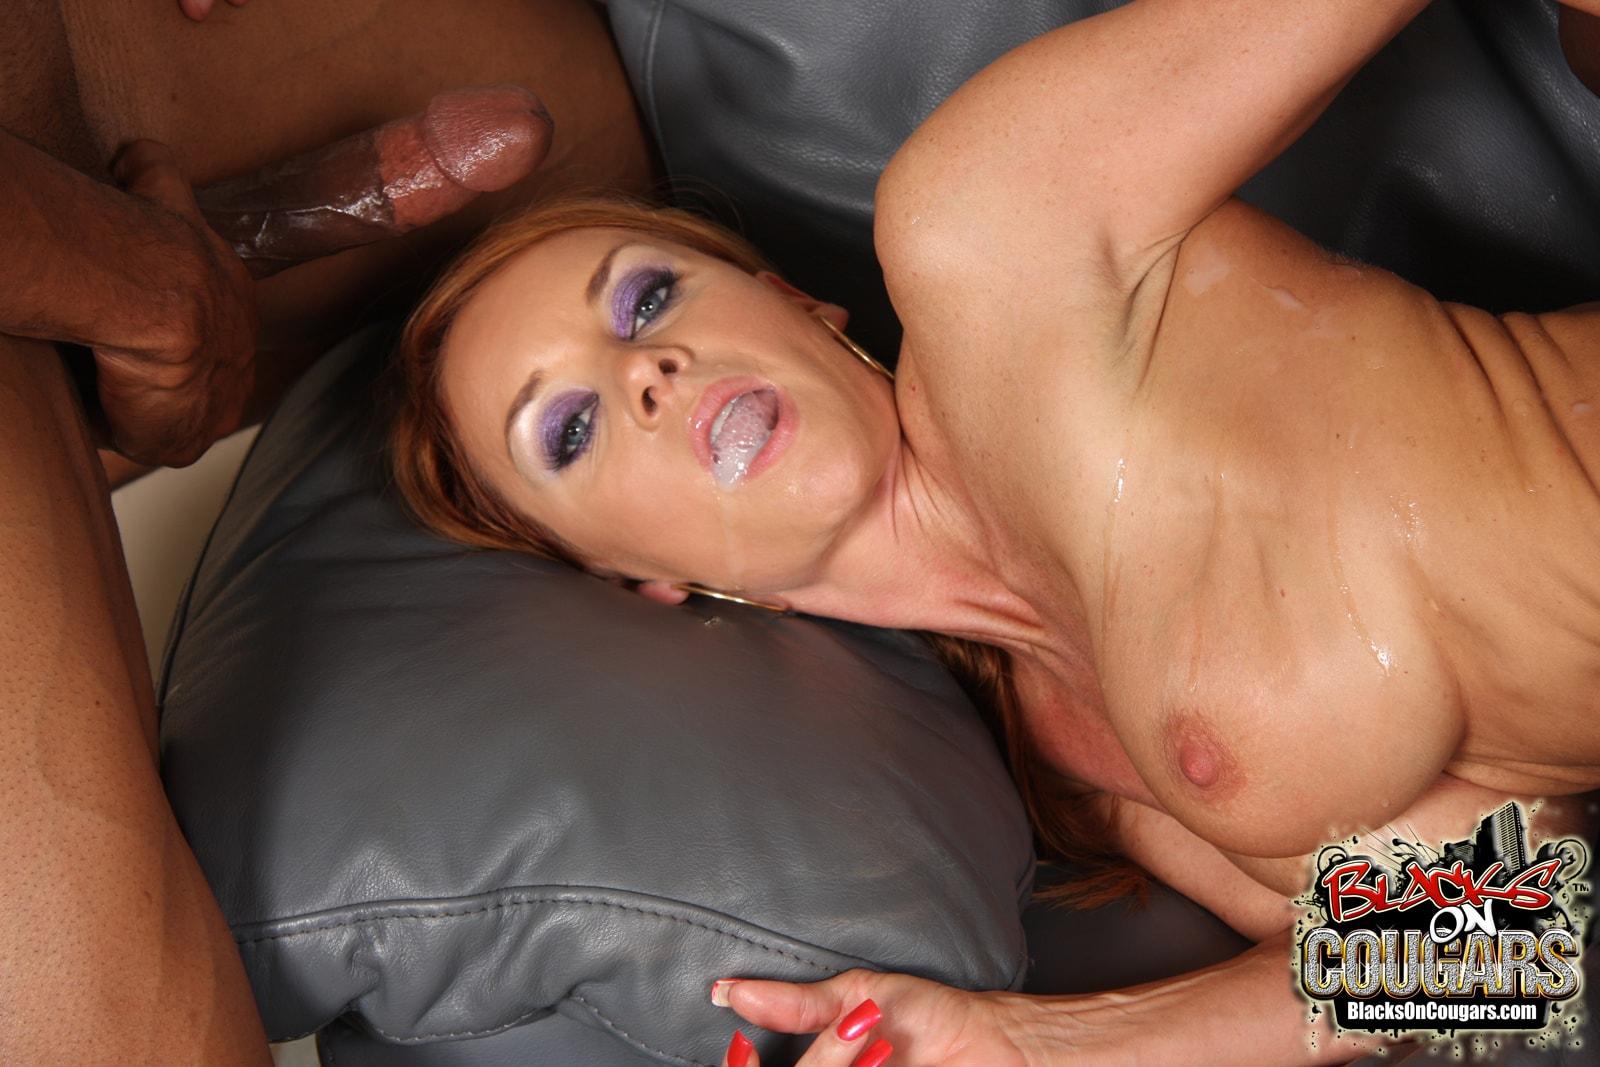 Dogfart '- Blacks On Cougars' starring Janet Mason (Photo 29)